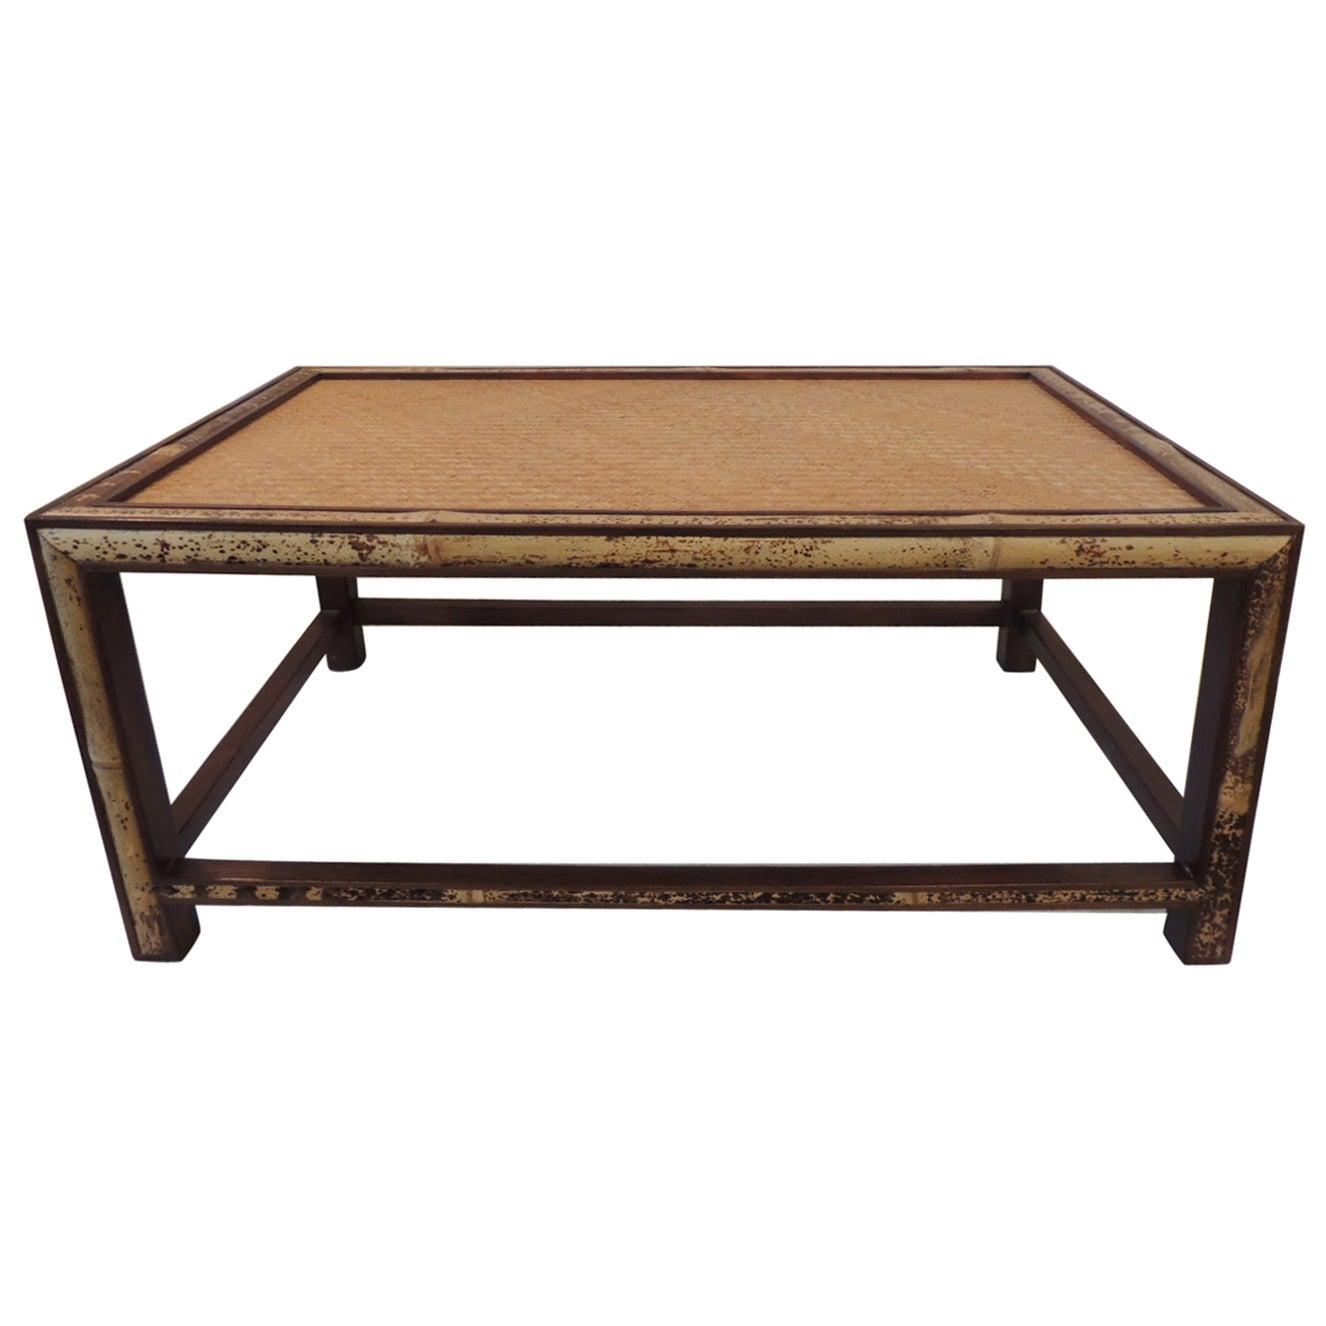 Vintage Bamboo and Rattan Rectangular Coffee Table